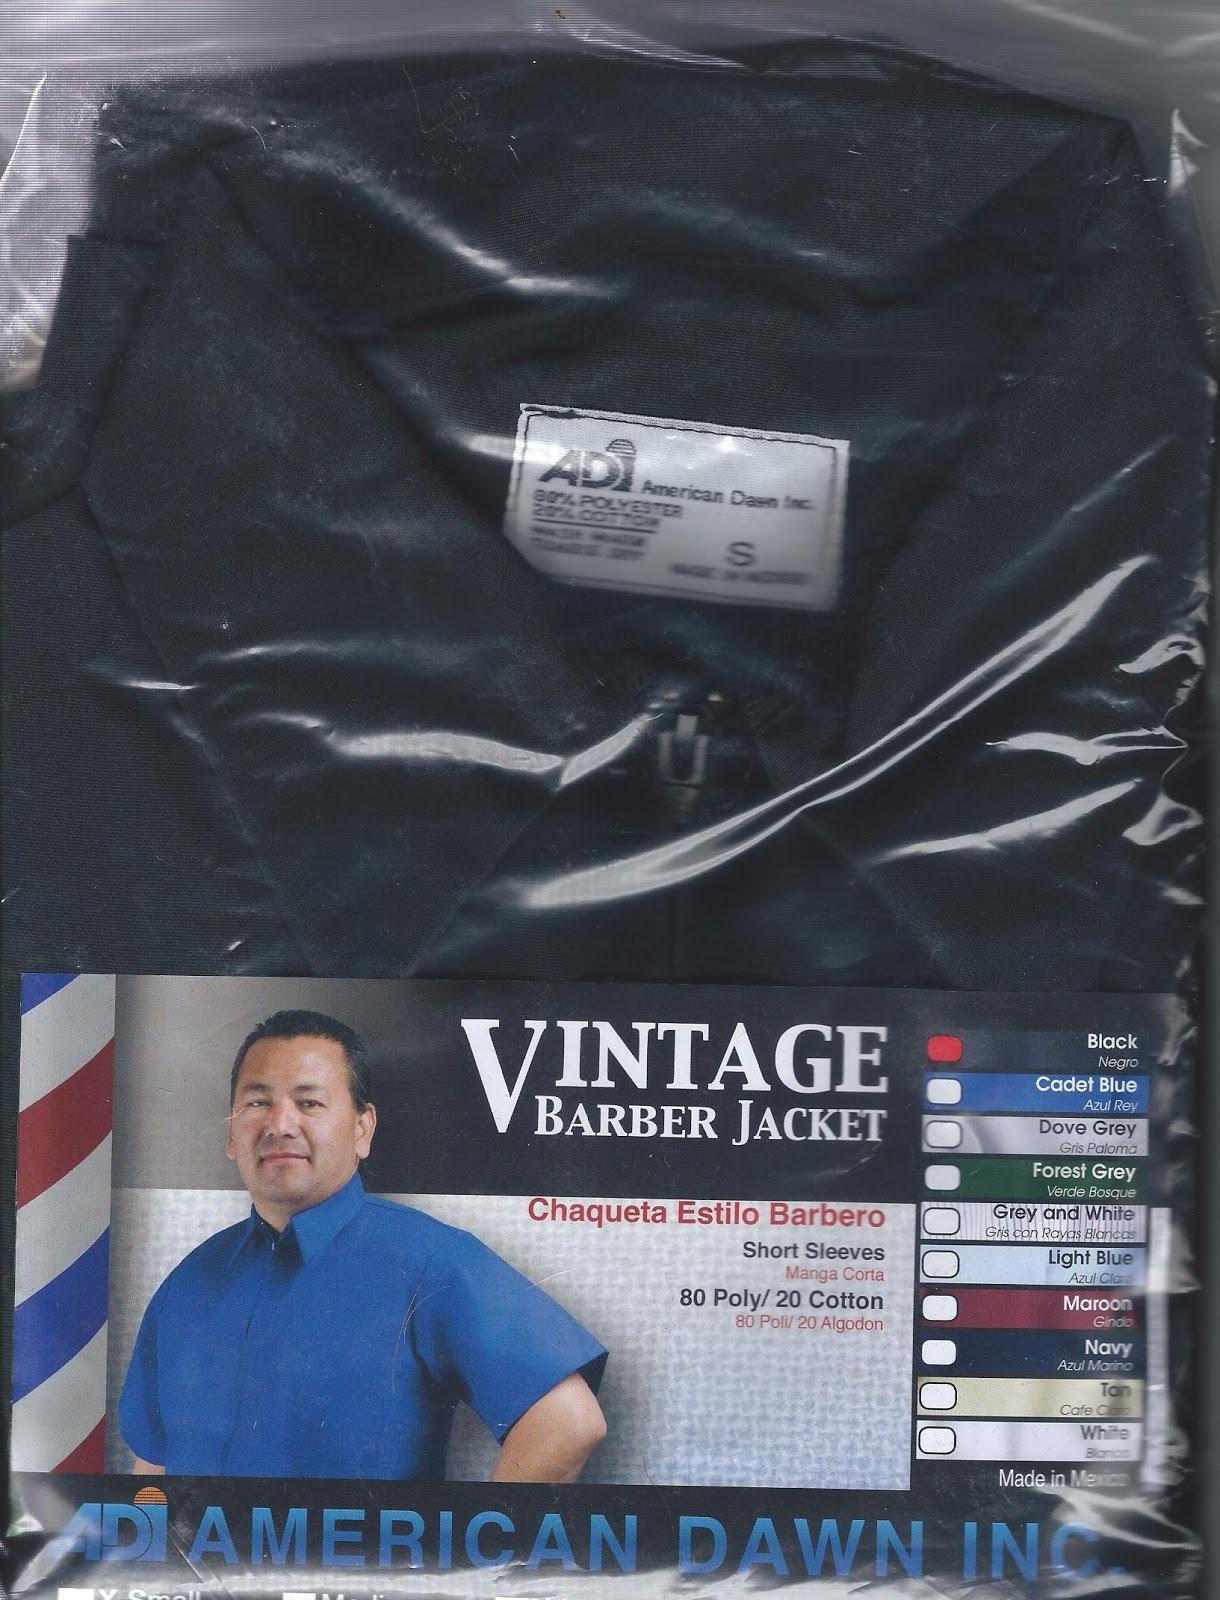 Barber Jackets And Capes : Barber Jackets And Capes